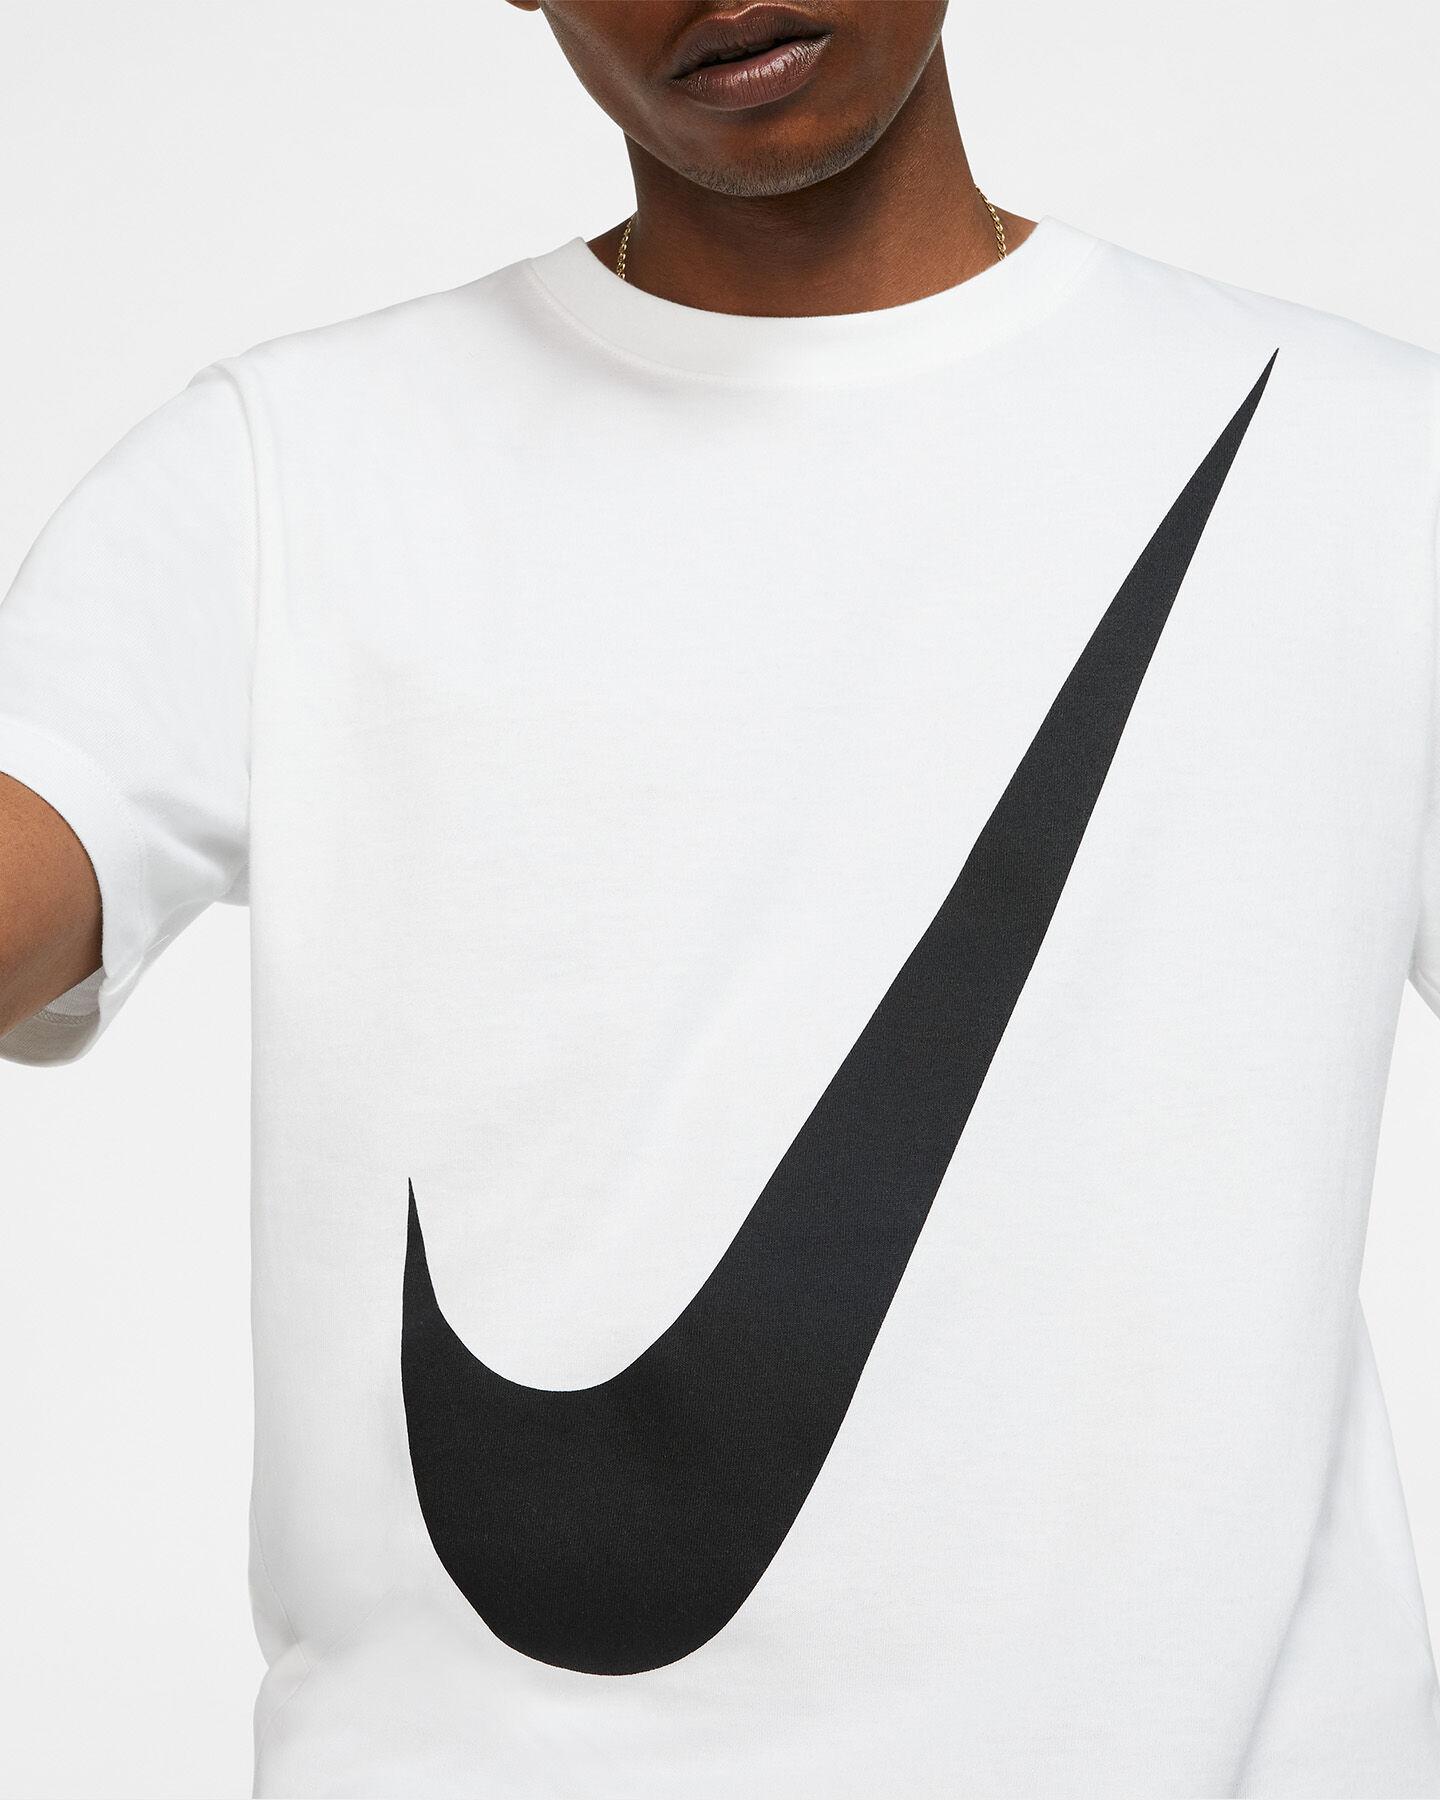 T-Shirt NIKE BIG SWOOSH M S5074370 scatto 4